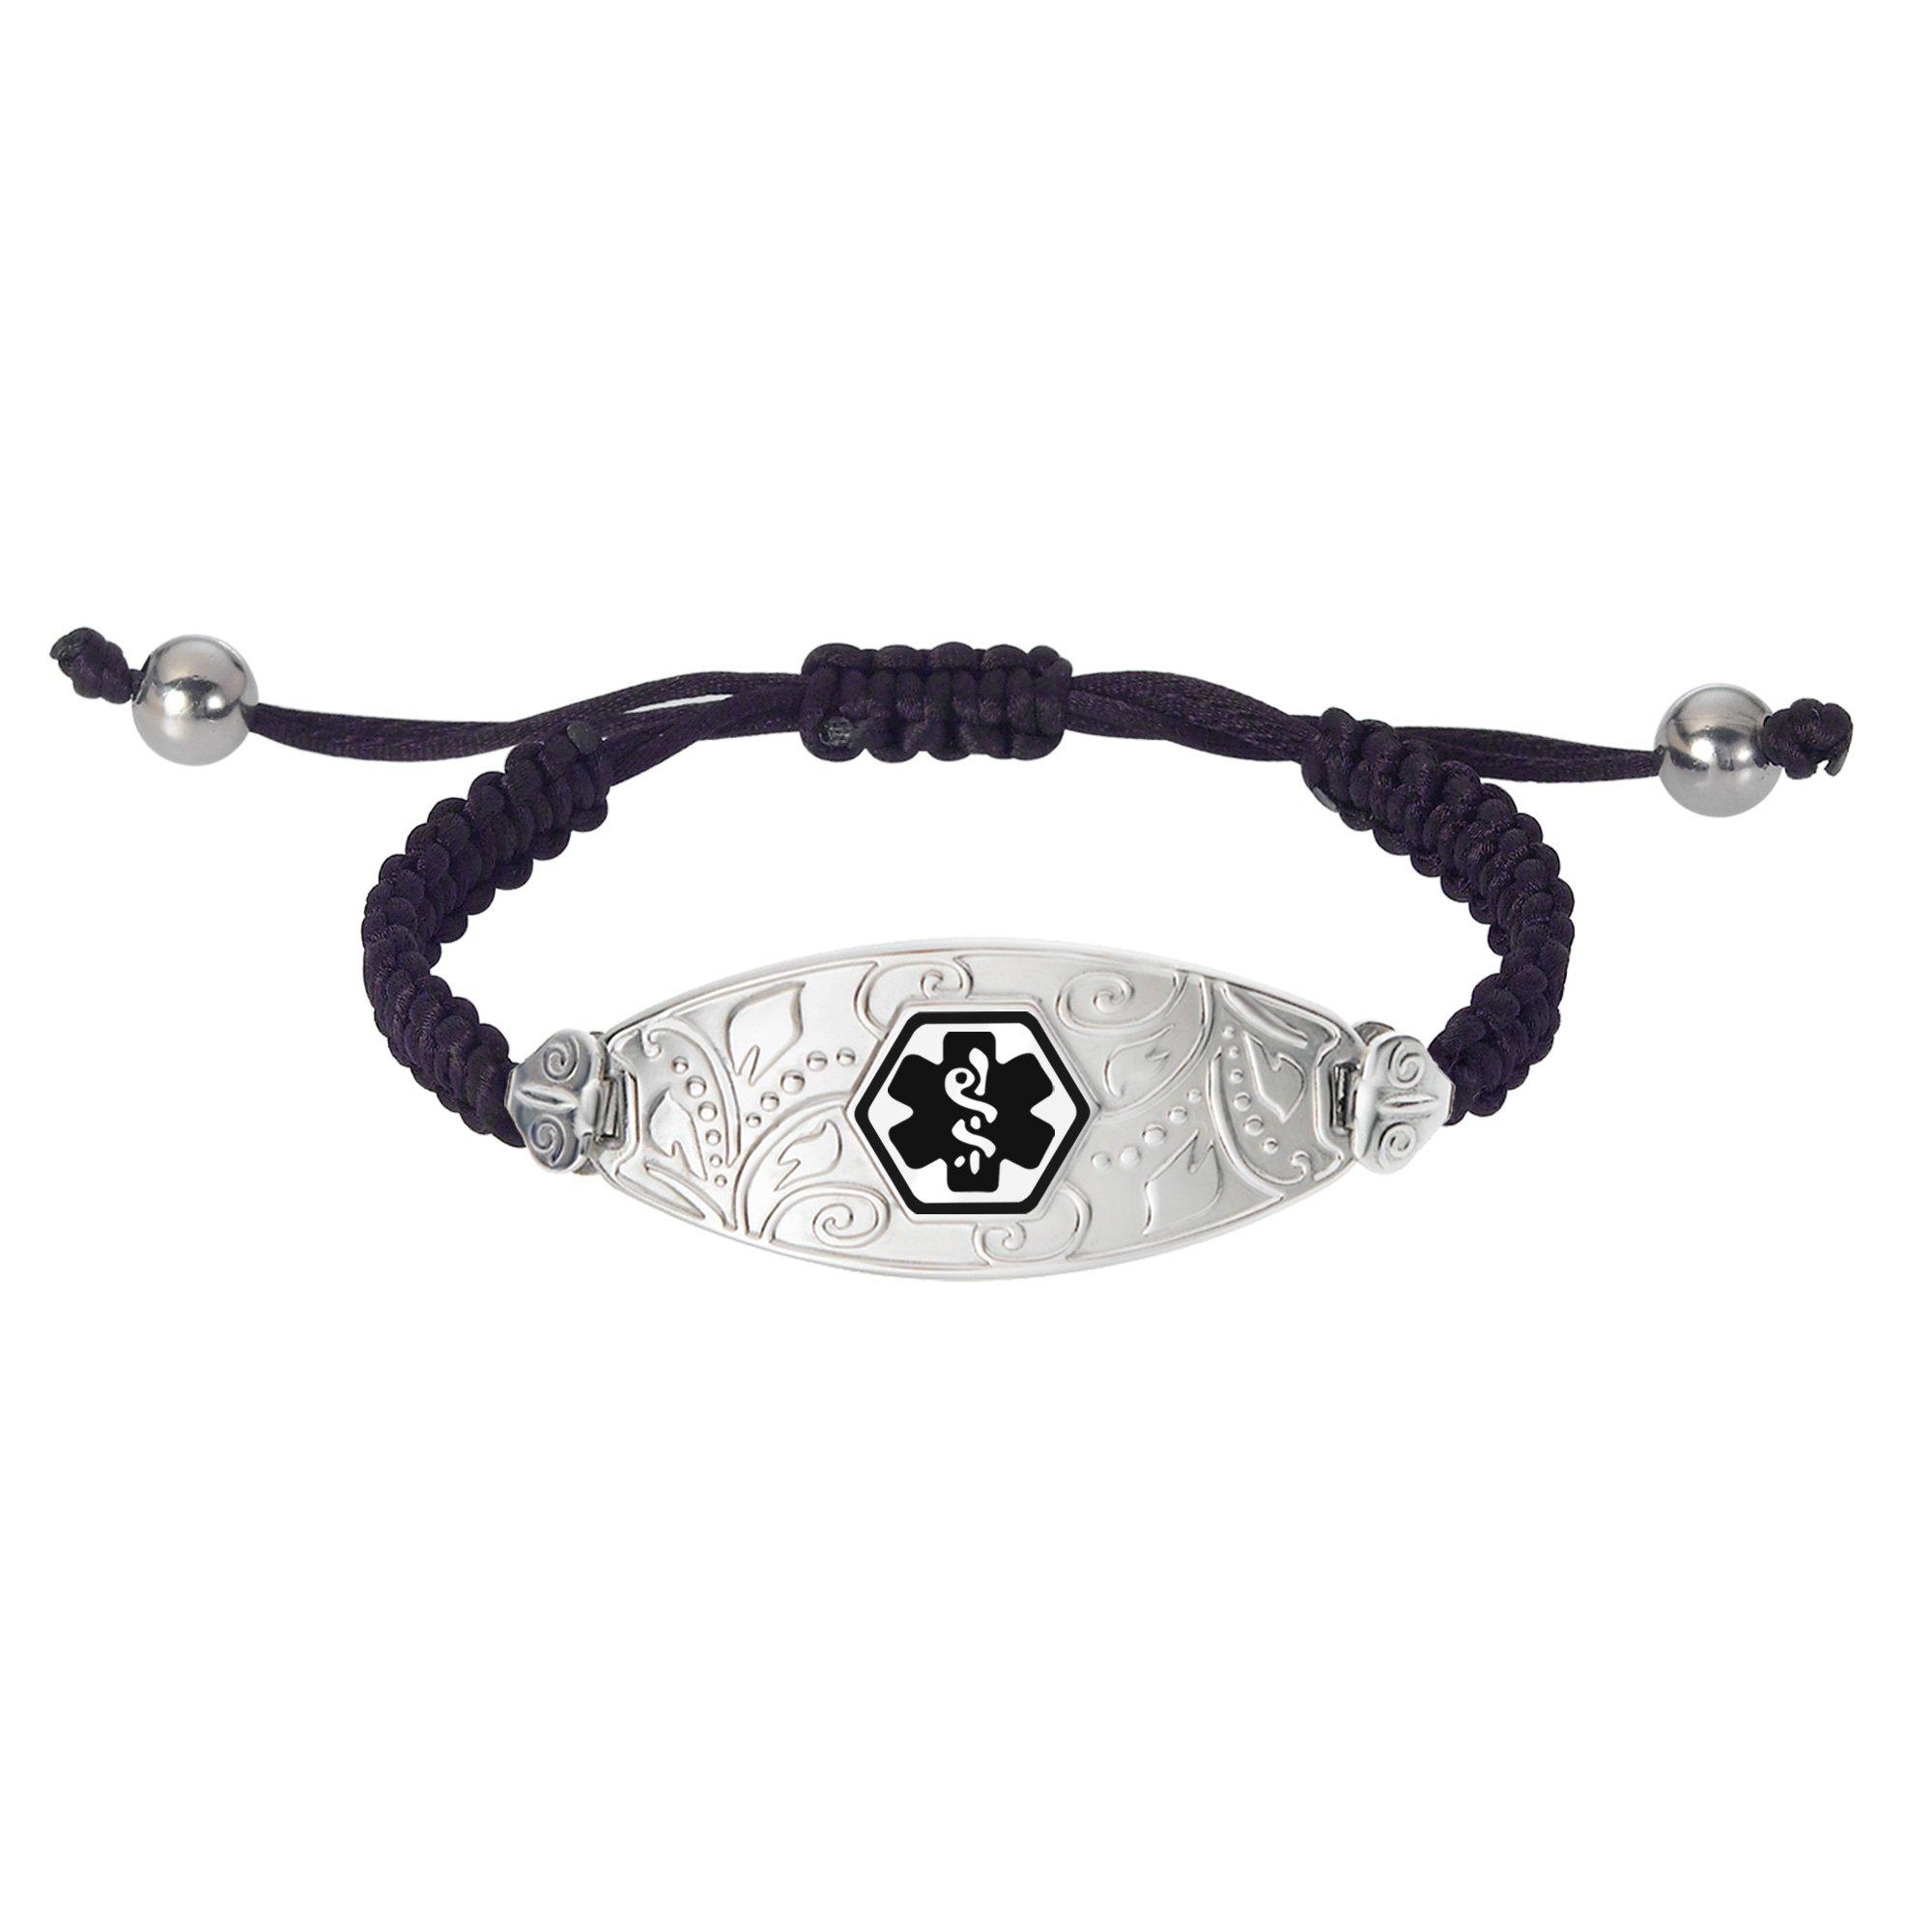 Divoti Deep Custom Laser Engraved Lovely Filigree Black Macrame Medical Alert Bracelet - Adjustable -Black